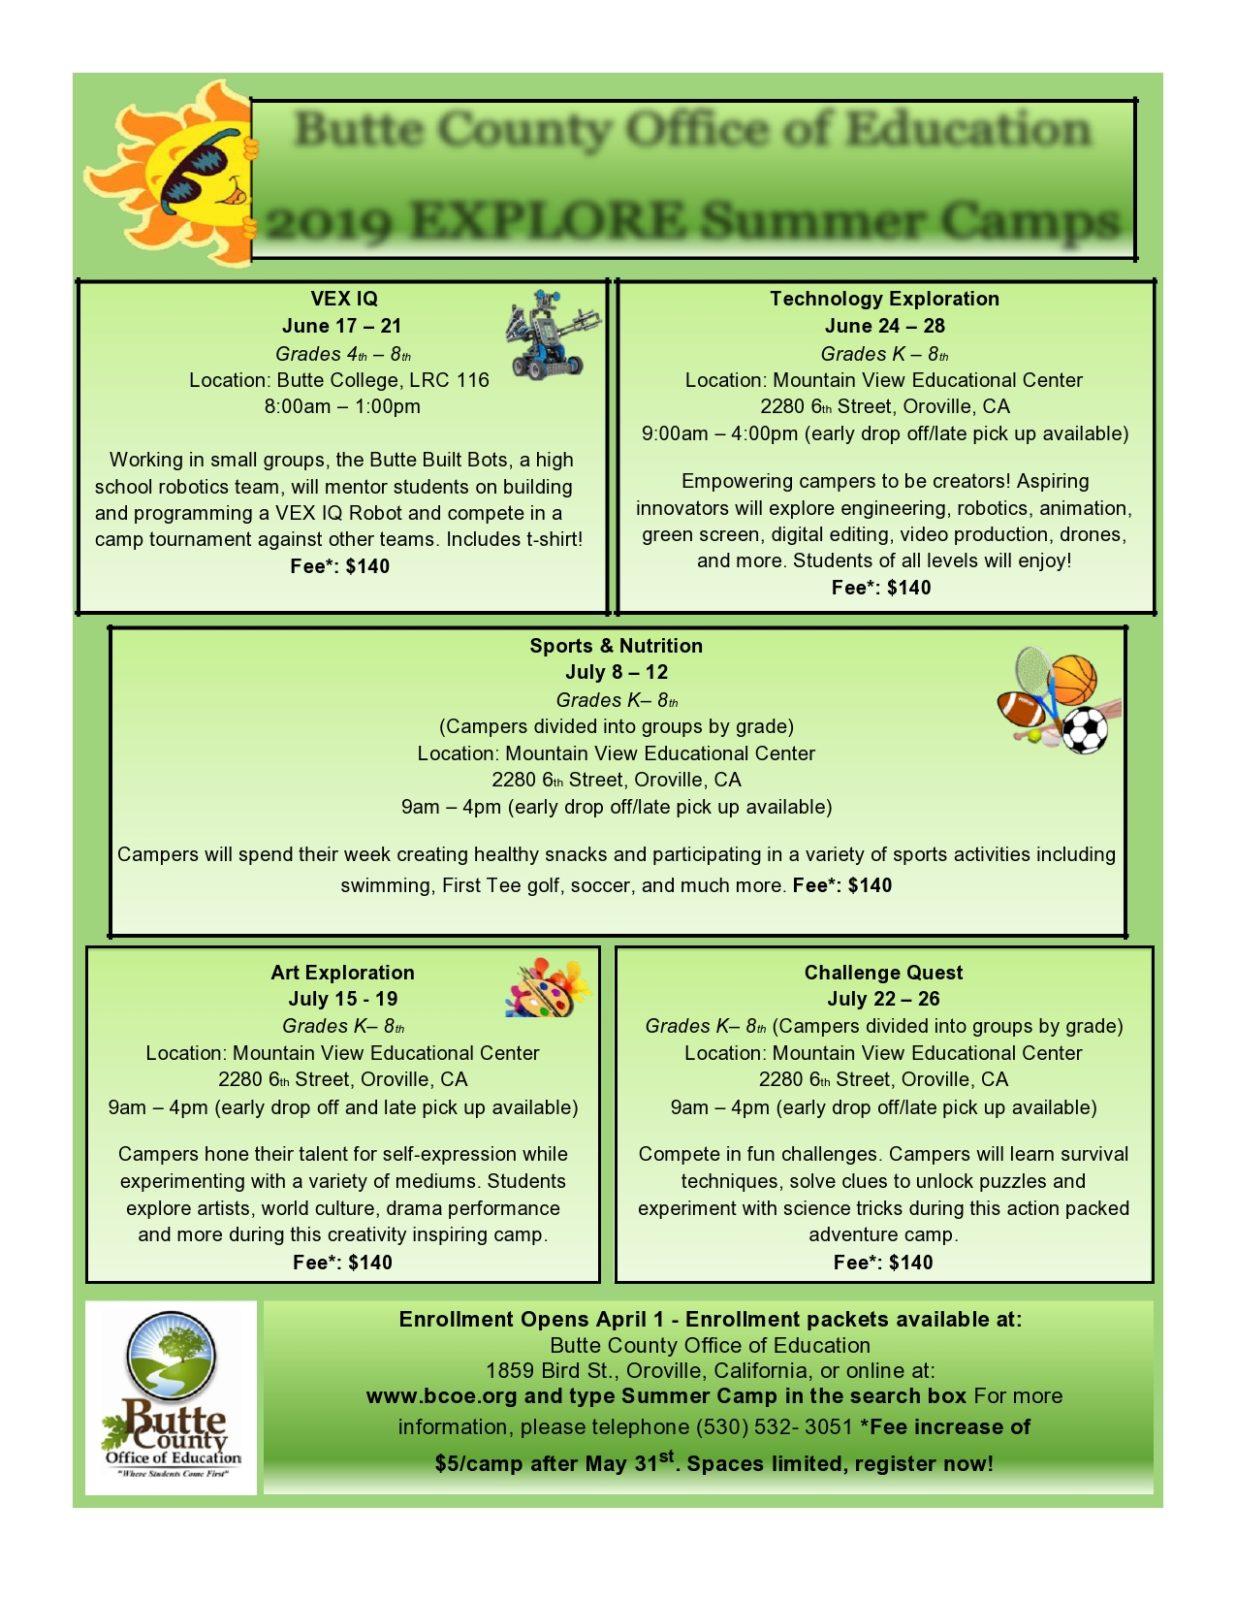 Free summer camp flyer 46